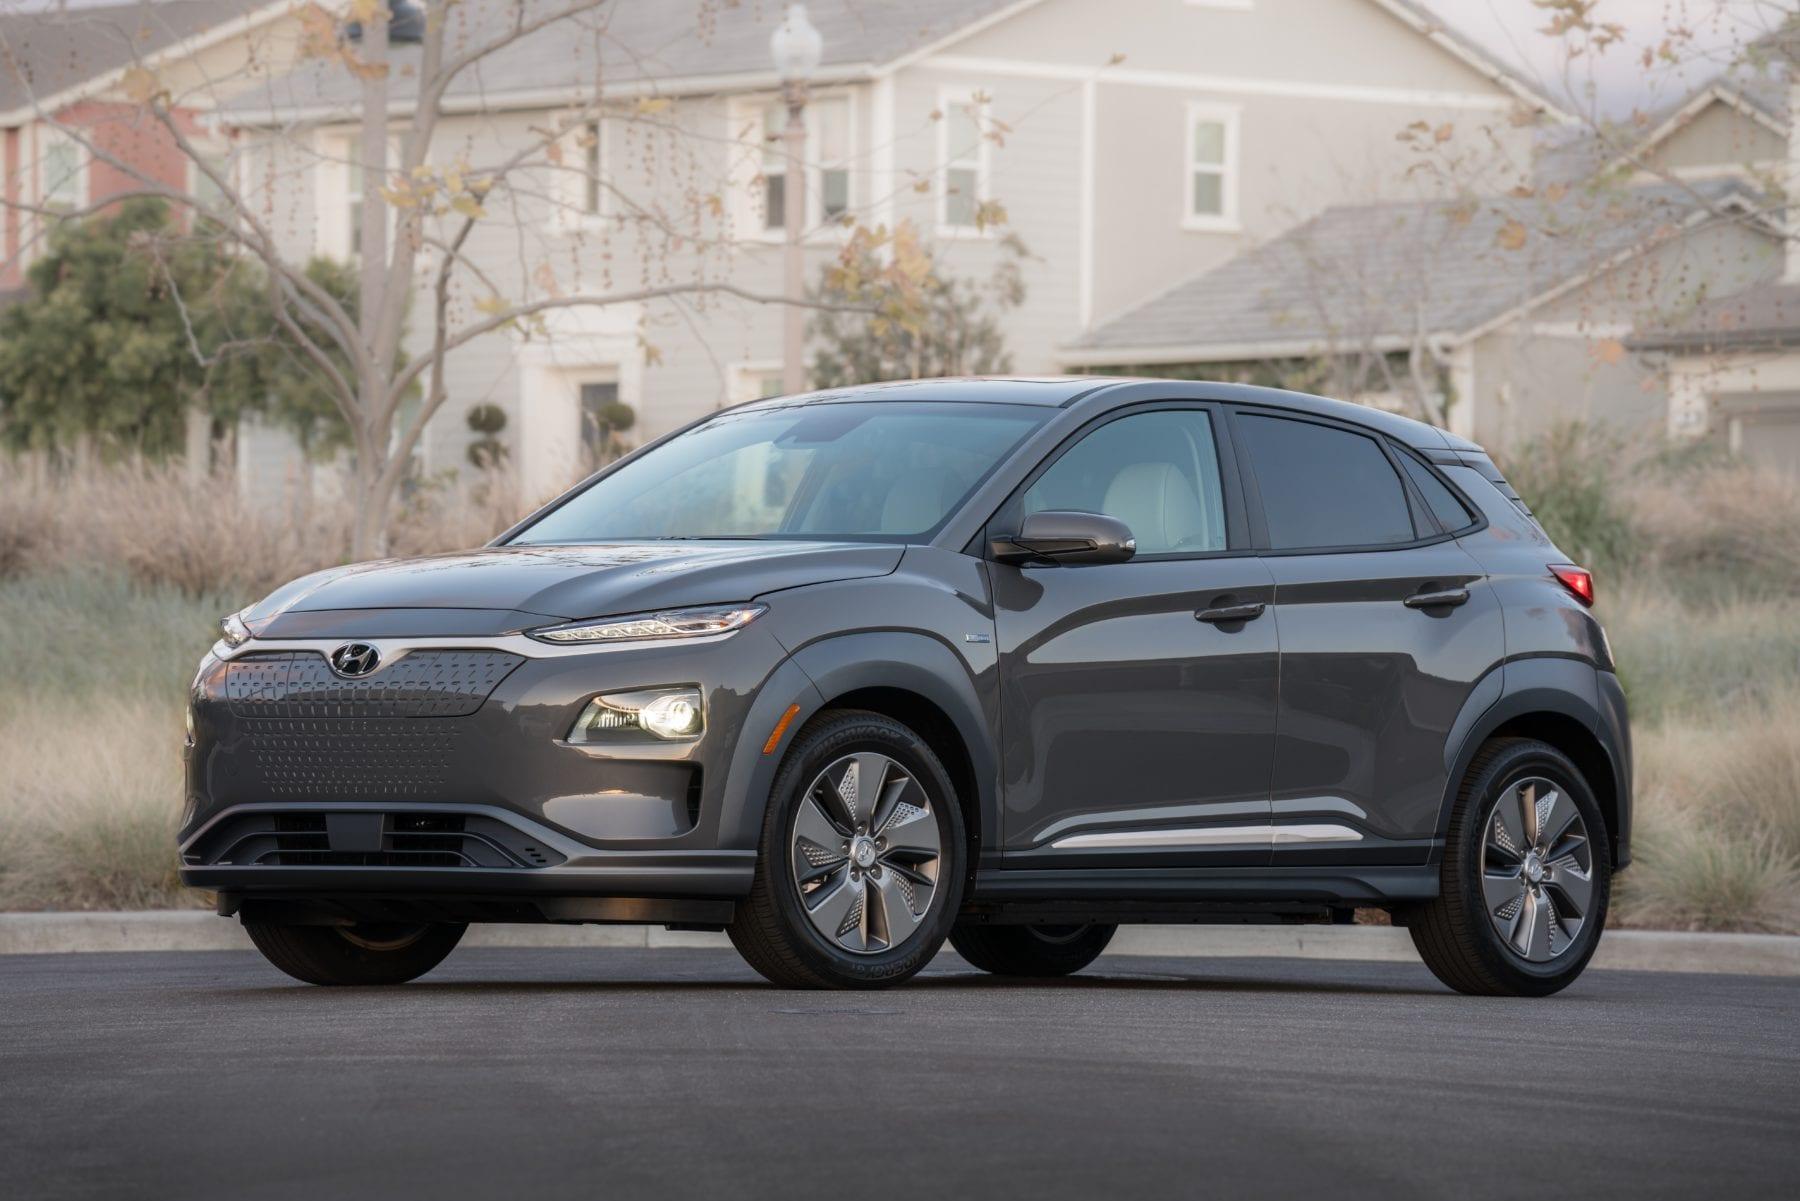 Hyundai Kona Electric Crossover